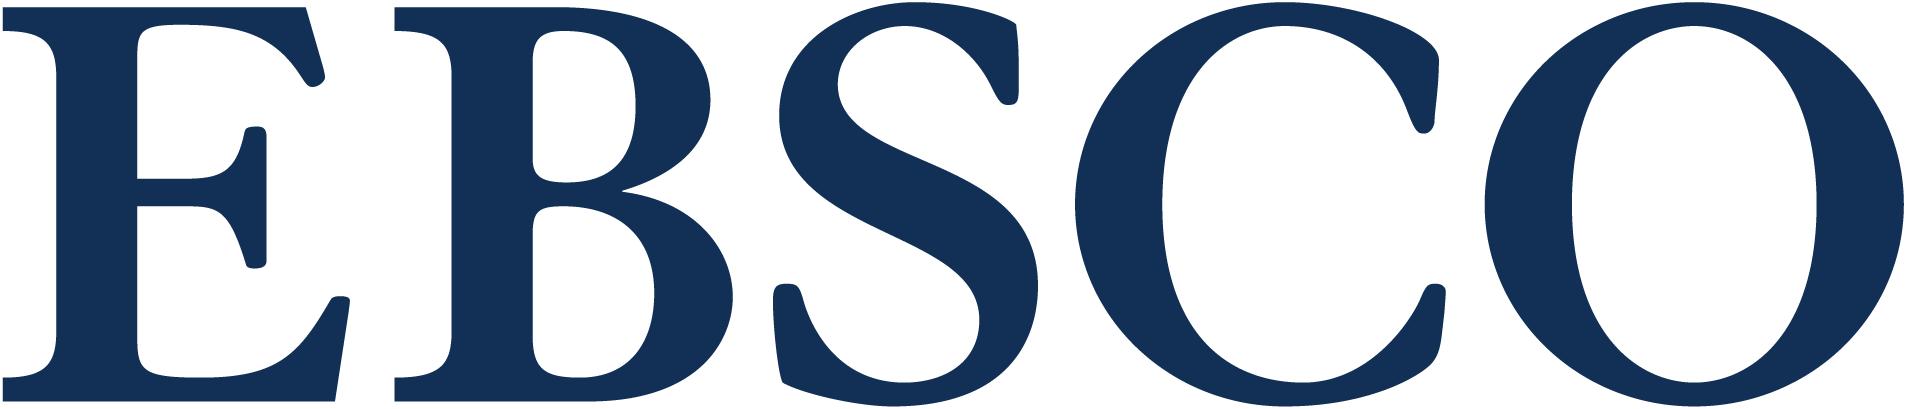 ebsco-logo-color-print